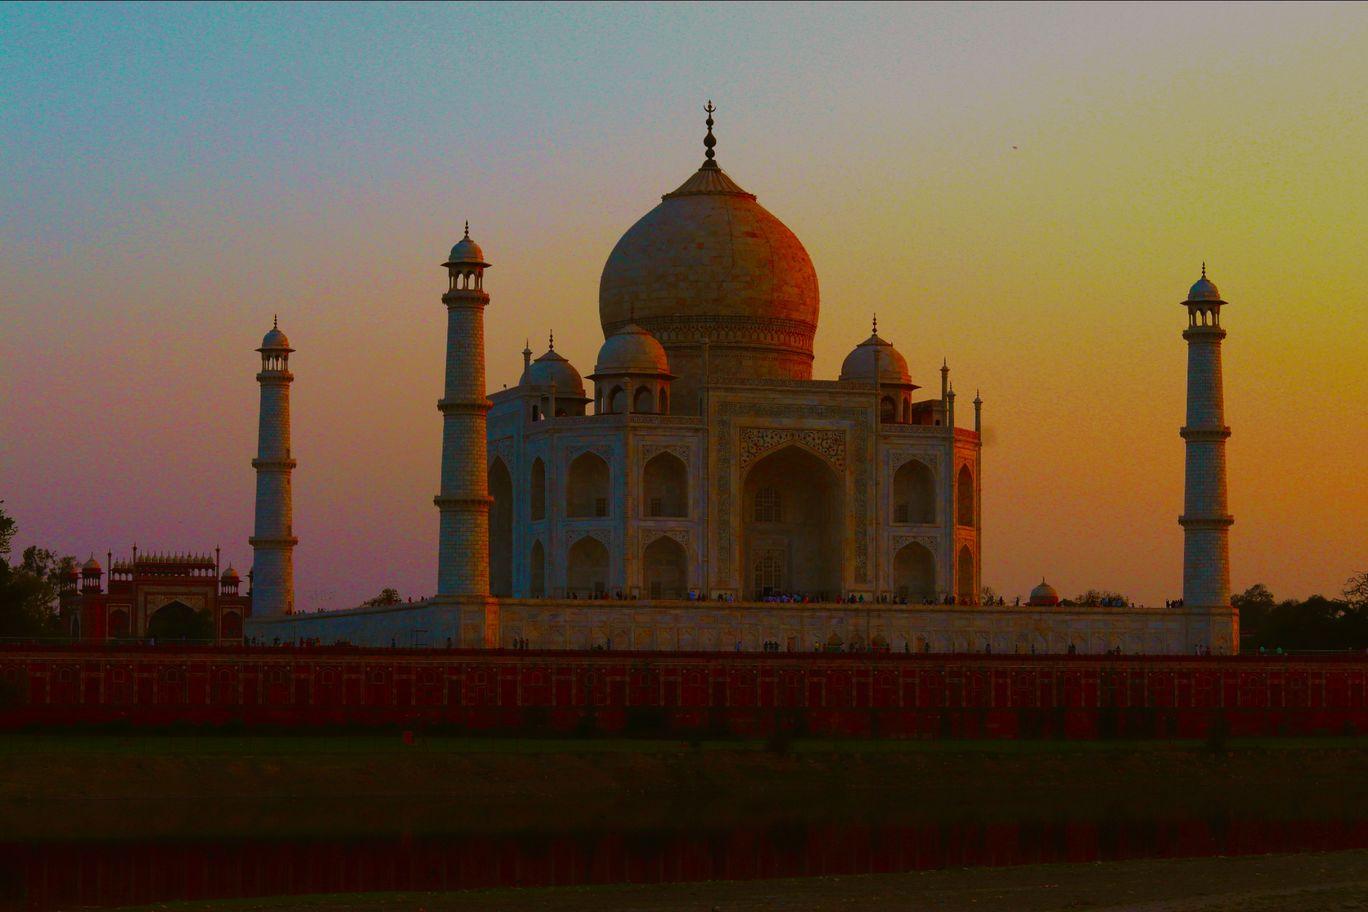 Photo of Agra By Shashank Upadhyay